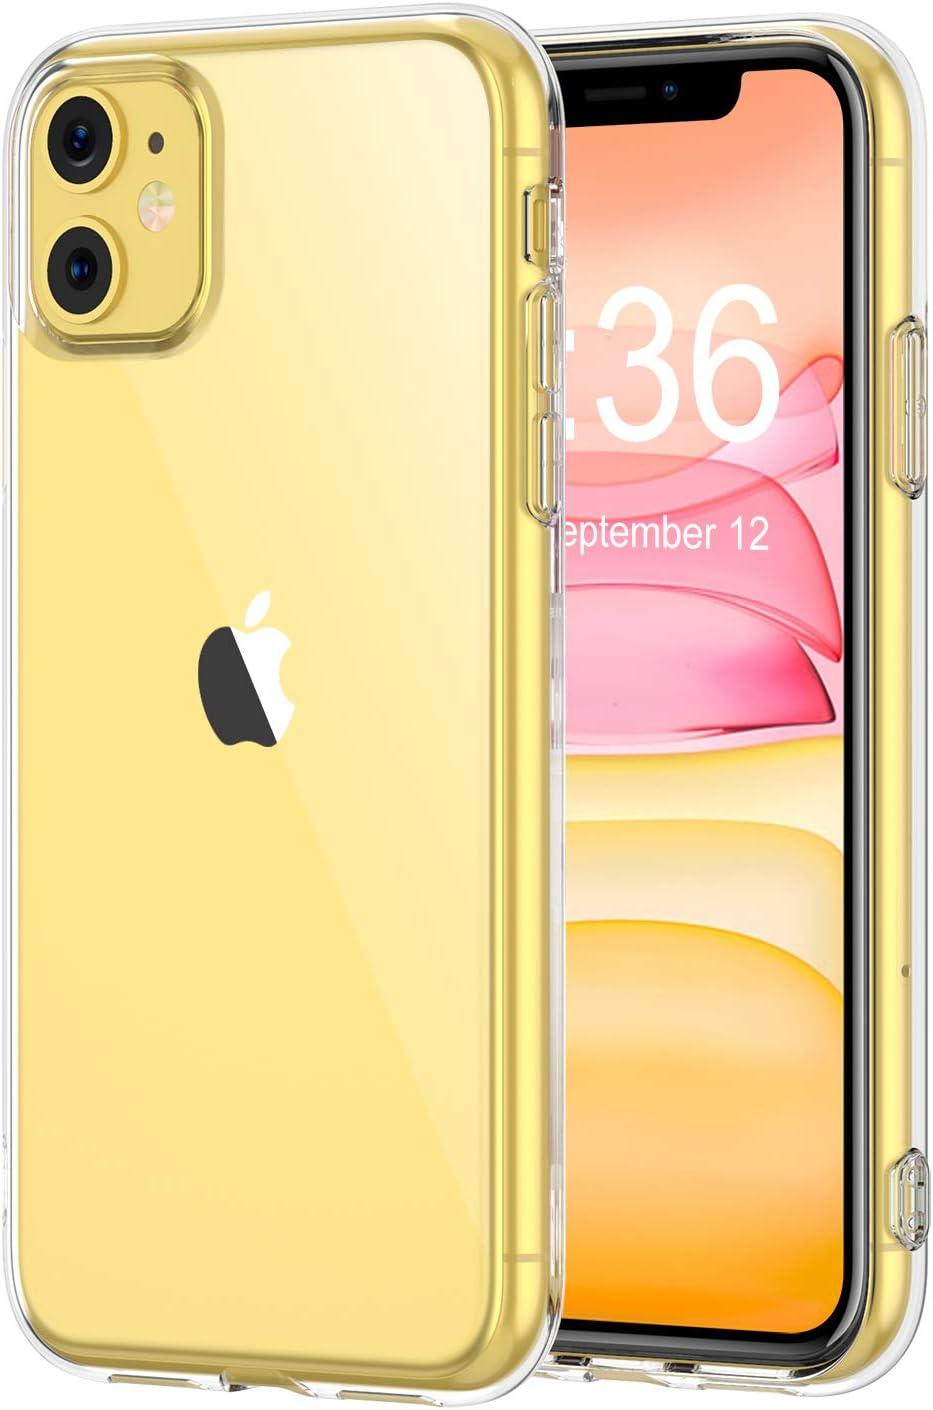 Coque Apple iPhone 11 Antichoc Miroir Ultra Mince Avec Flip Stand Protection Pour iPhone 11 (6.1